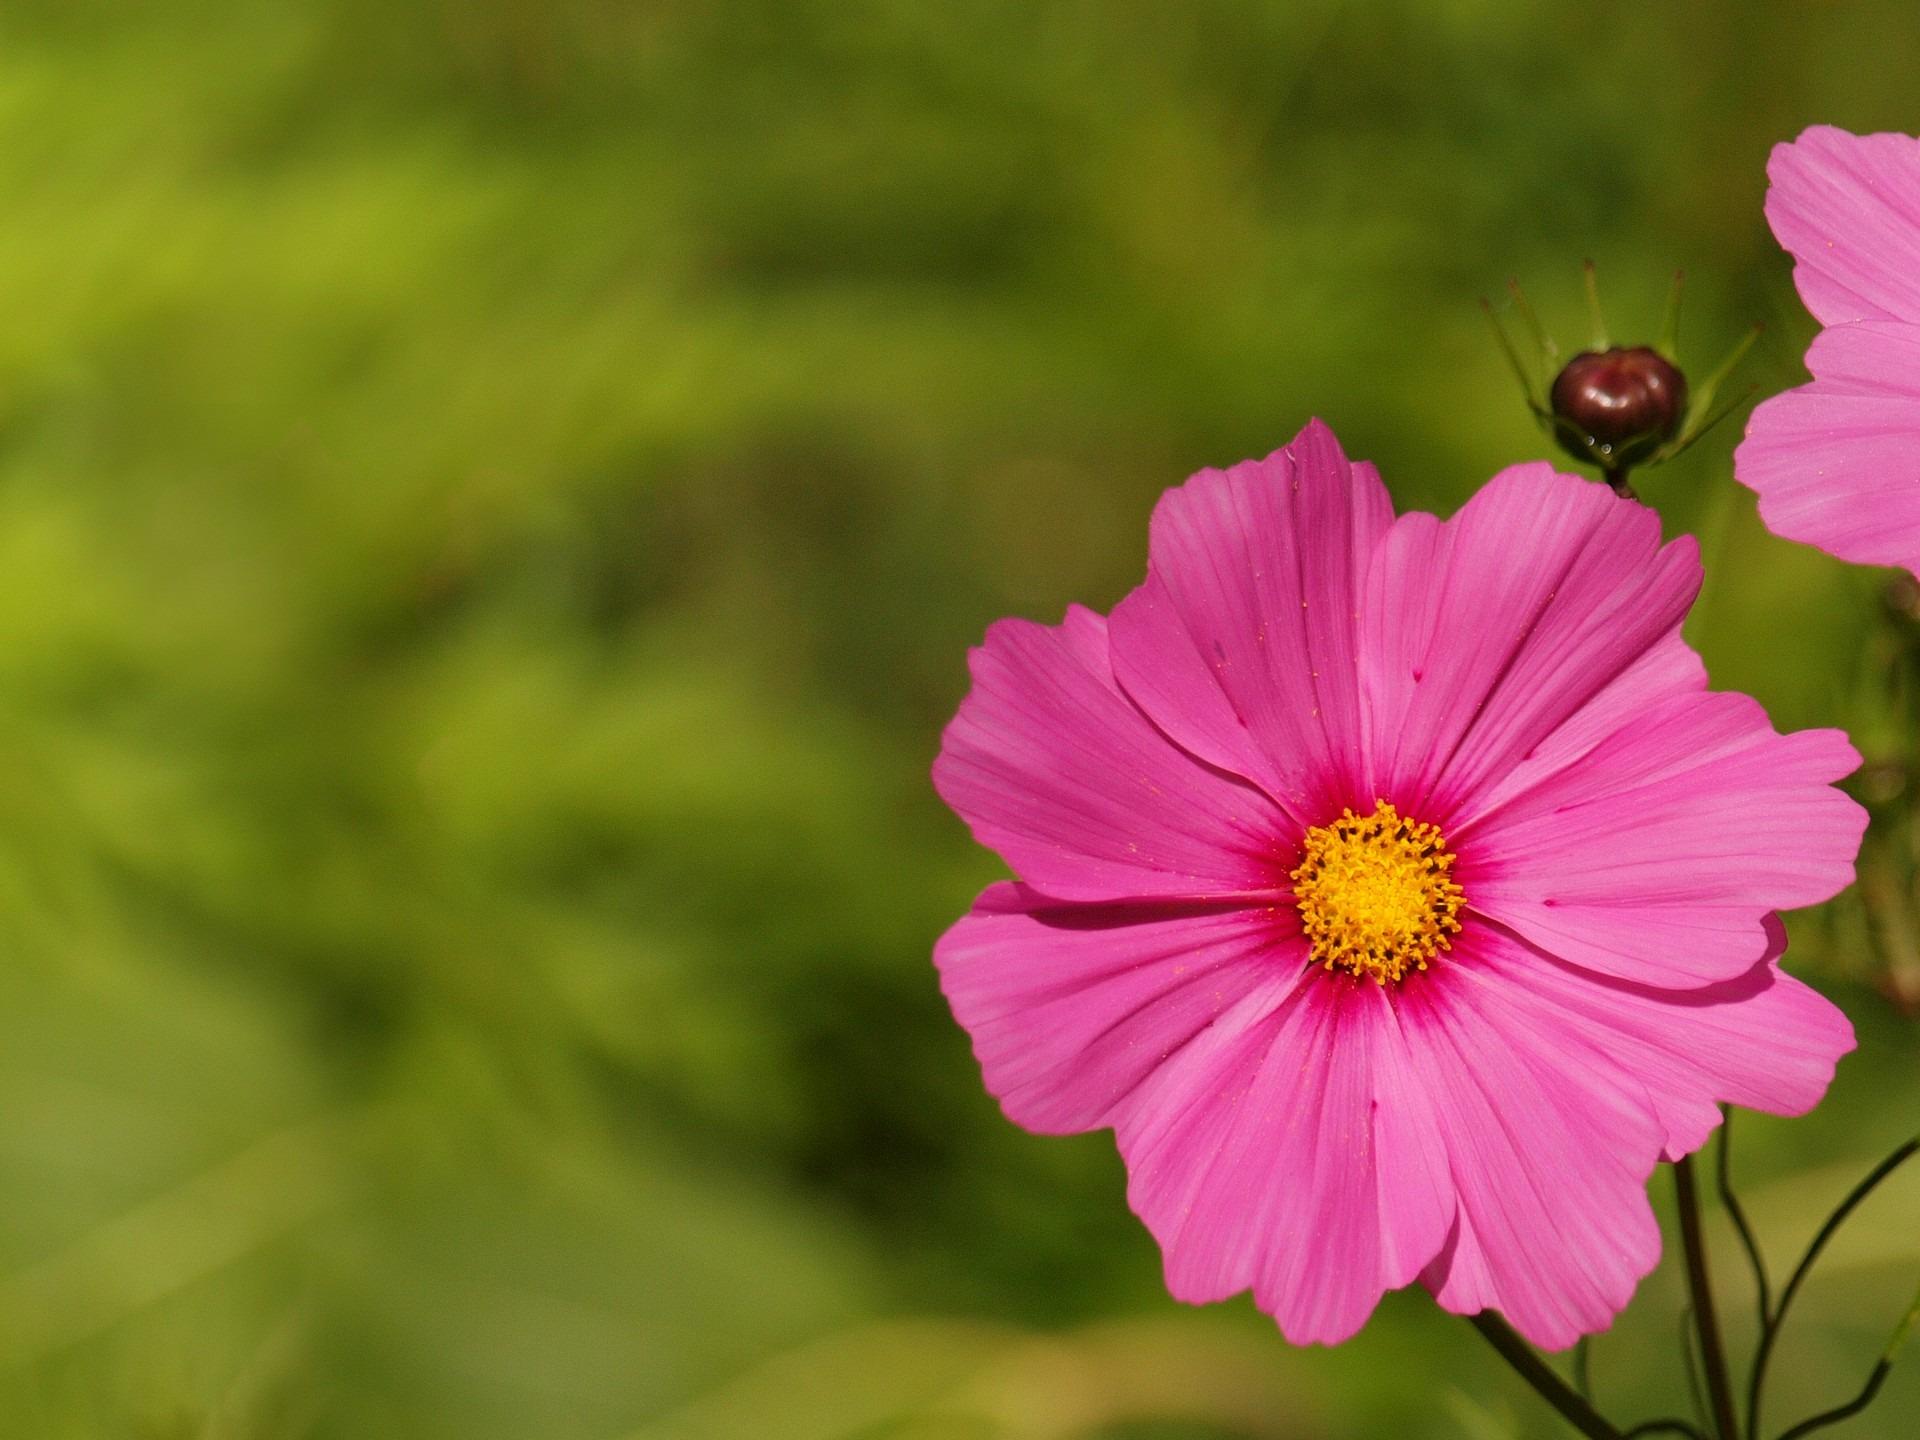 Free Images Bokeh Meadow Flower Petal Photo Summer Floral